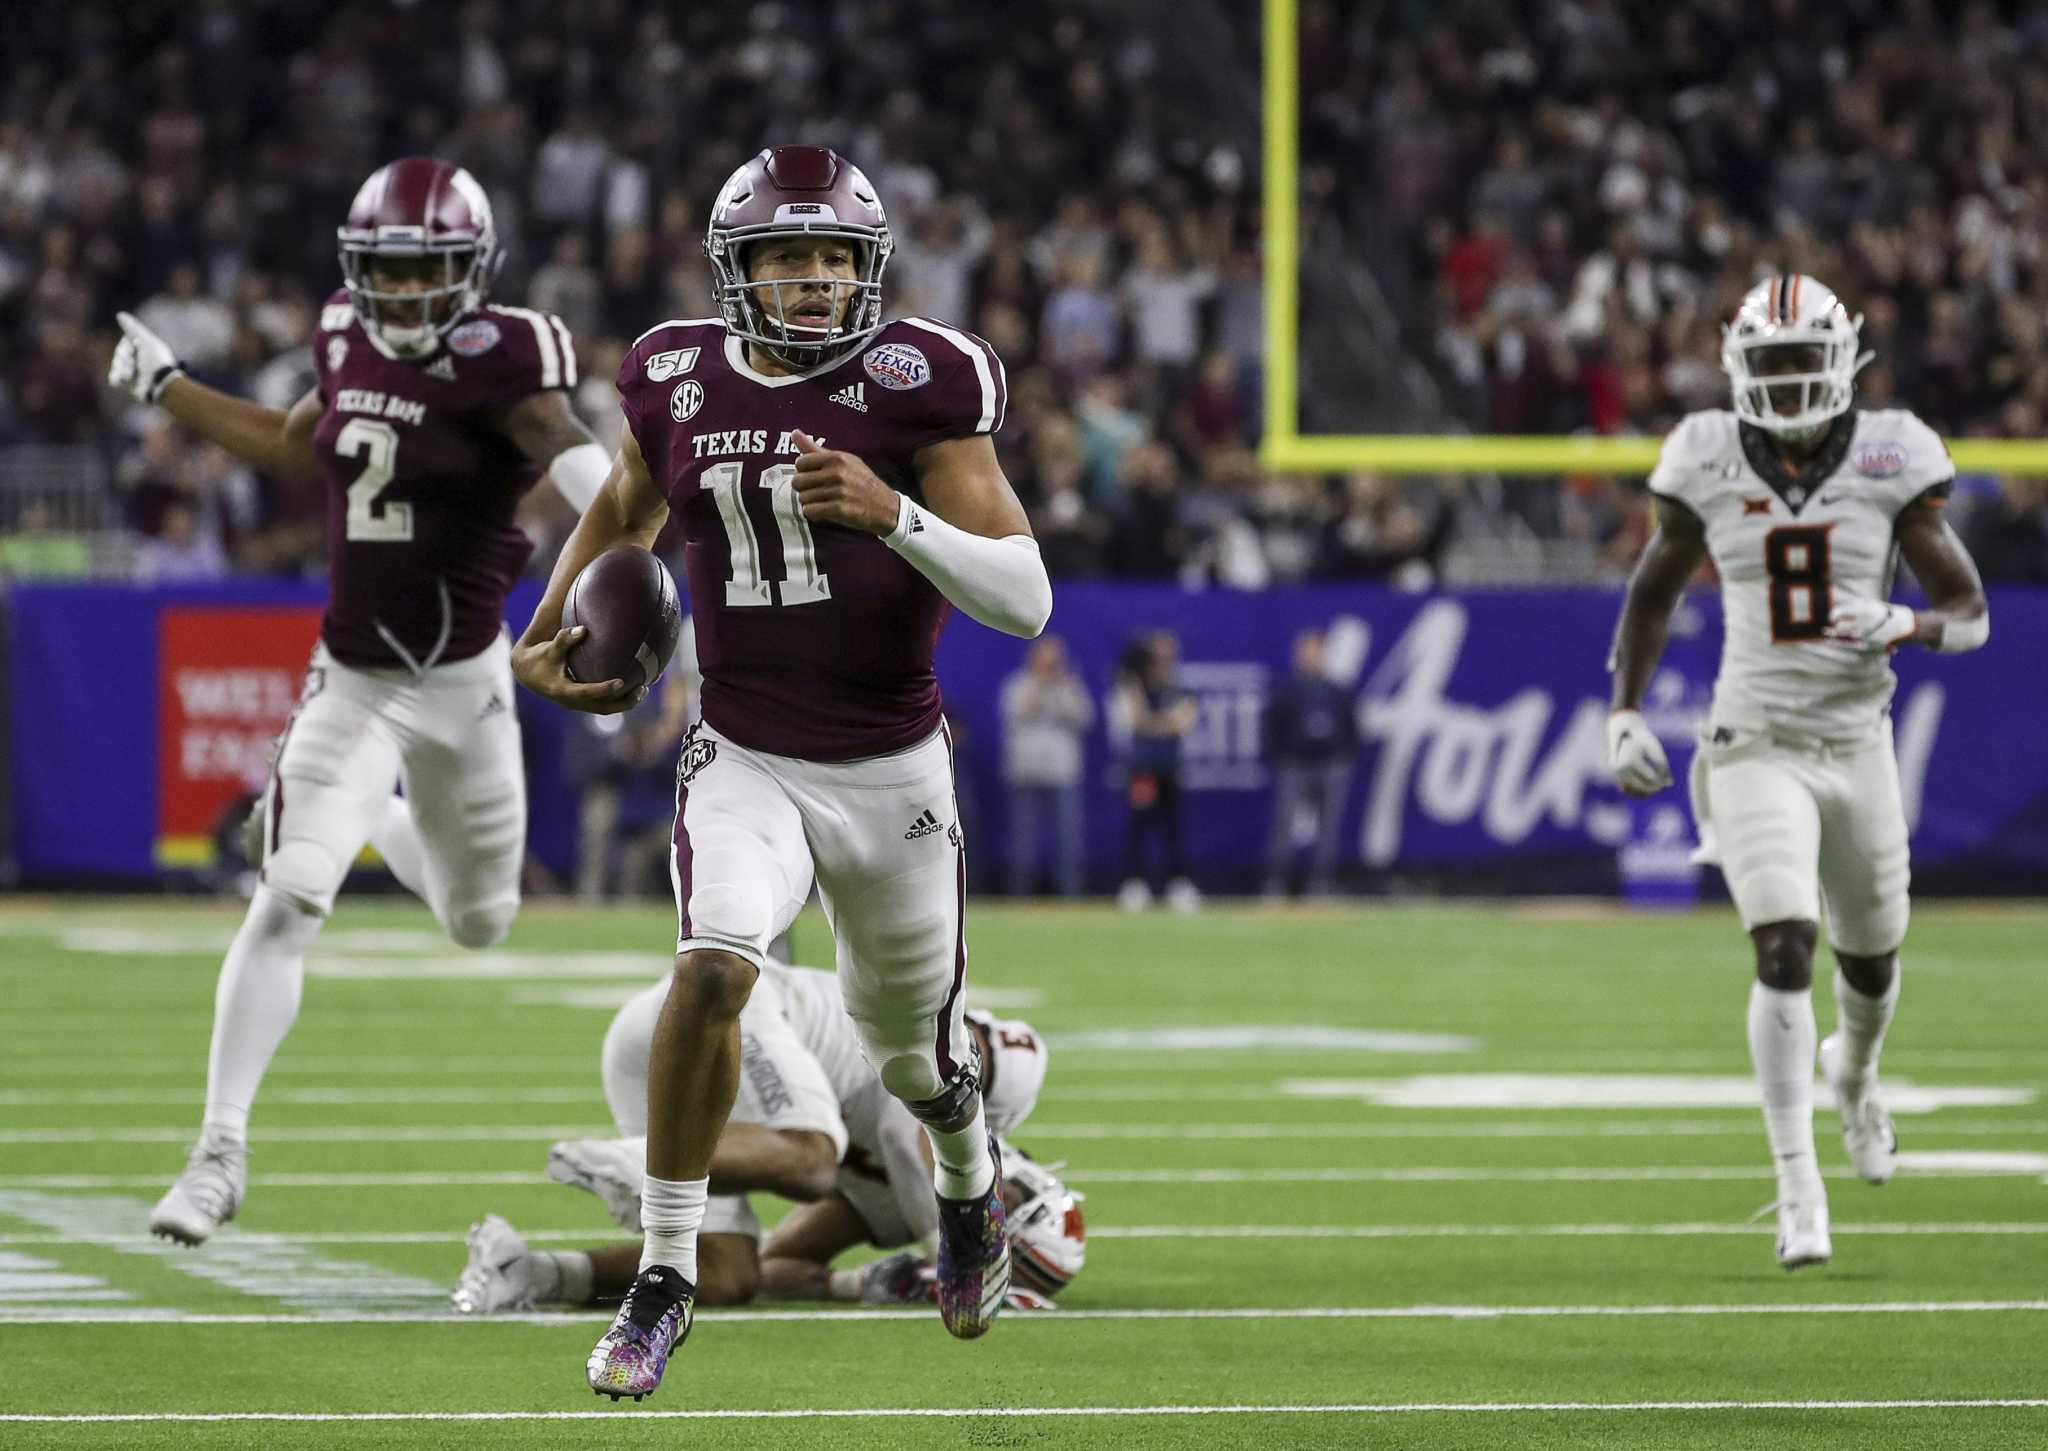 Texas A&M QB Kellen Mond remains confident